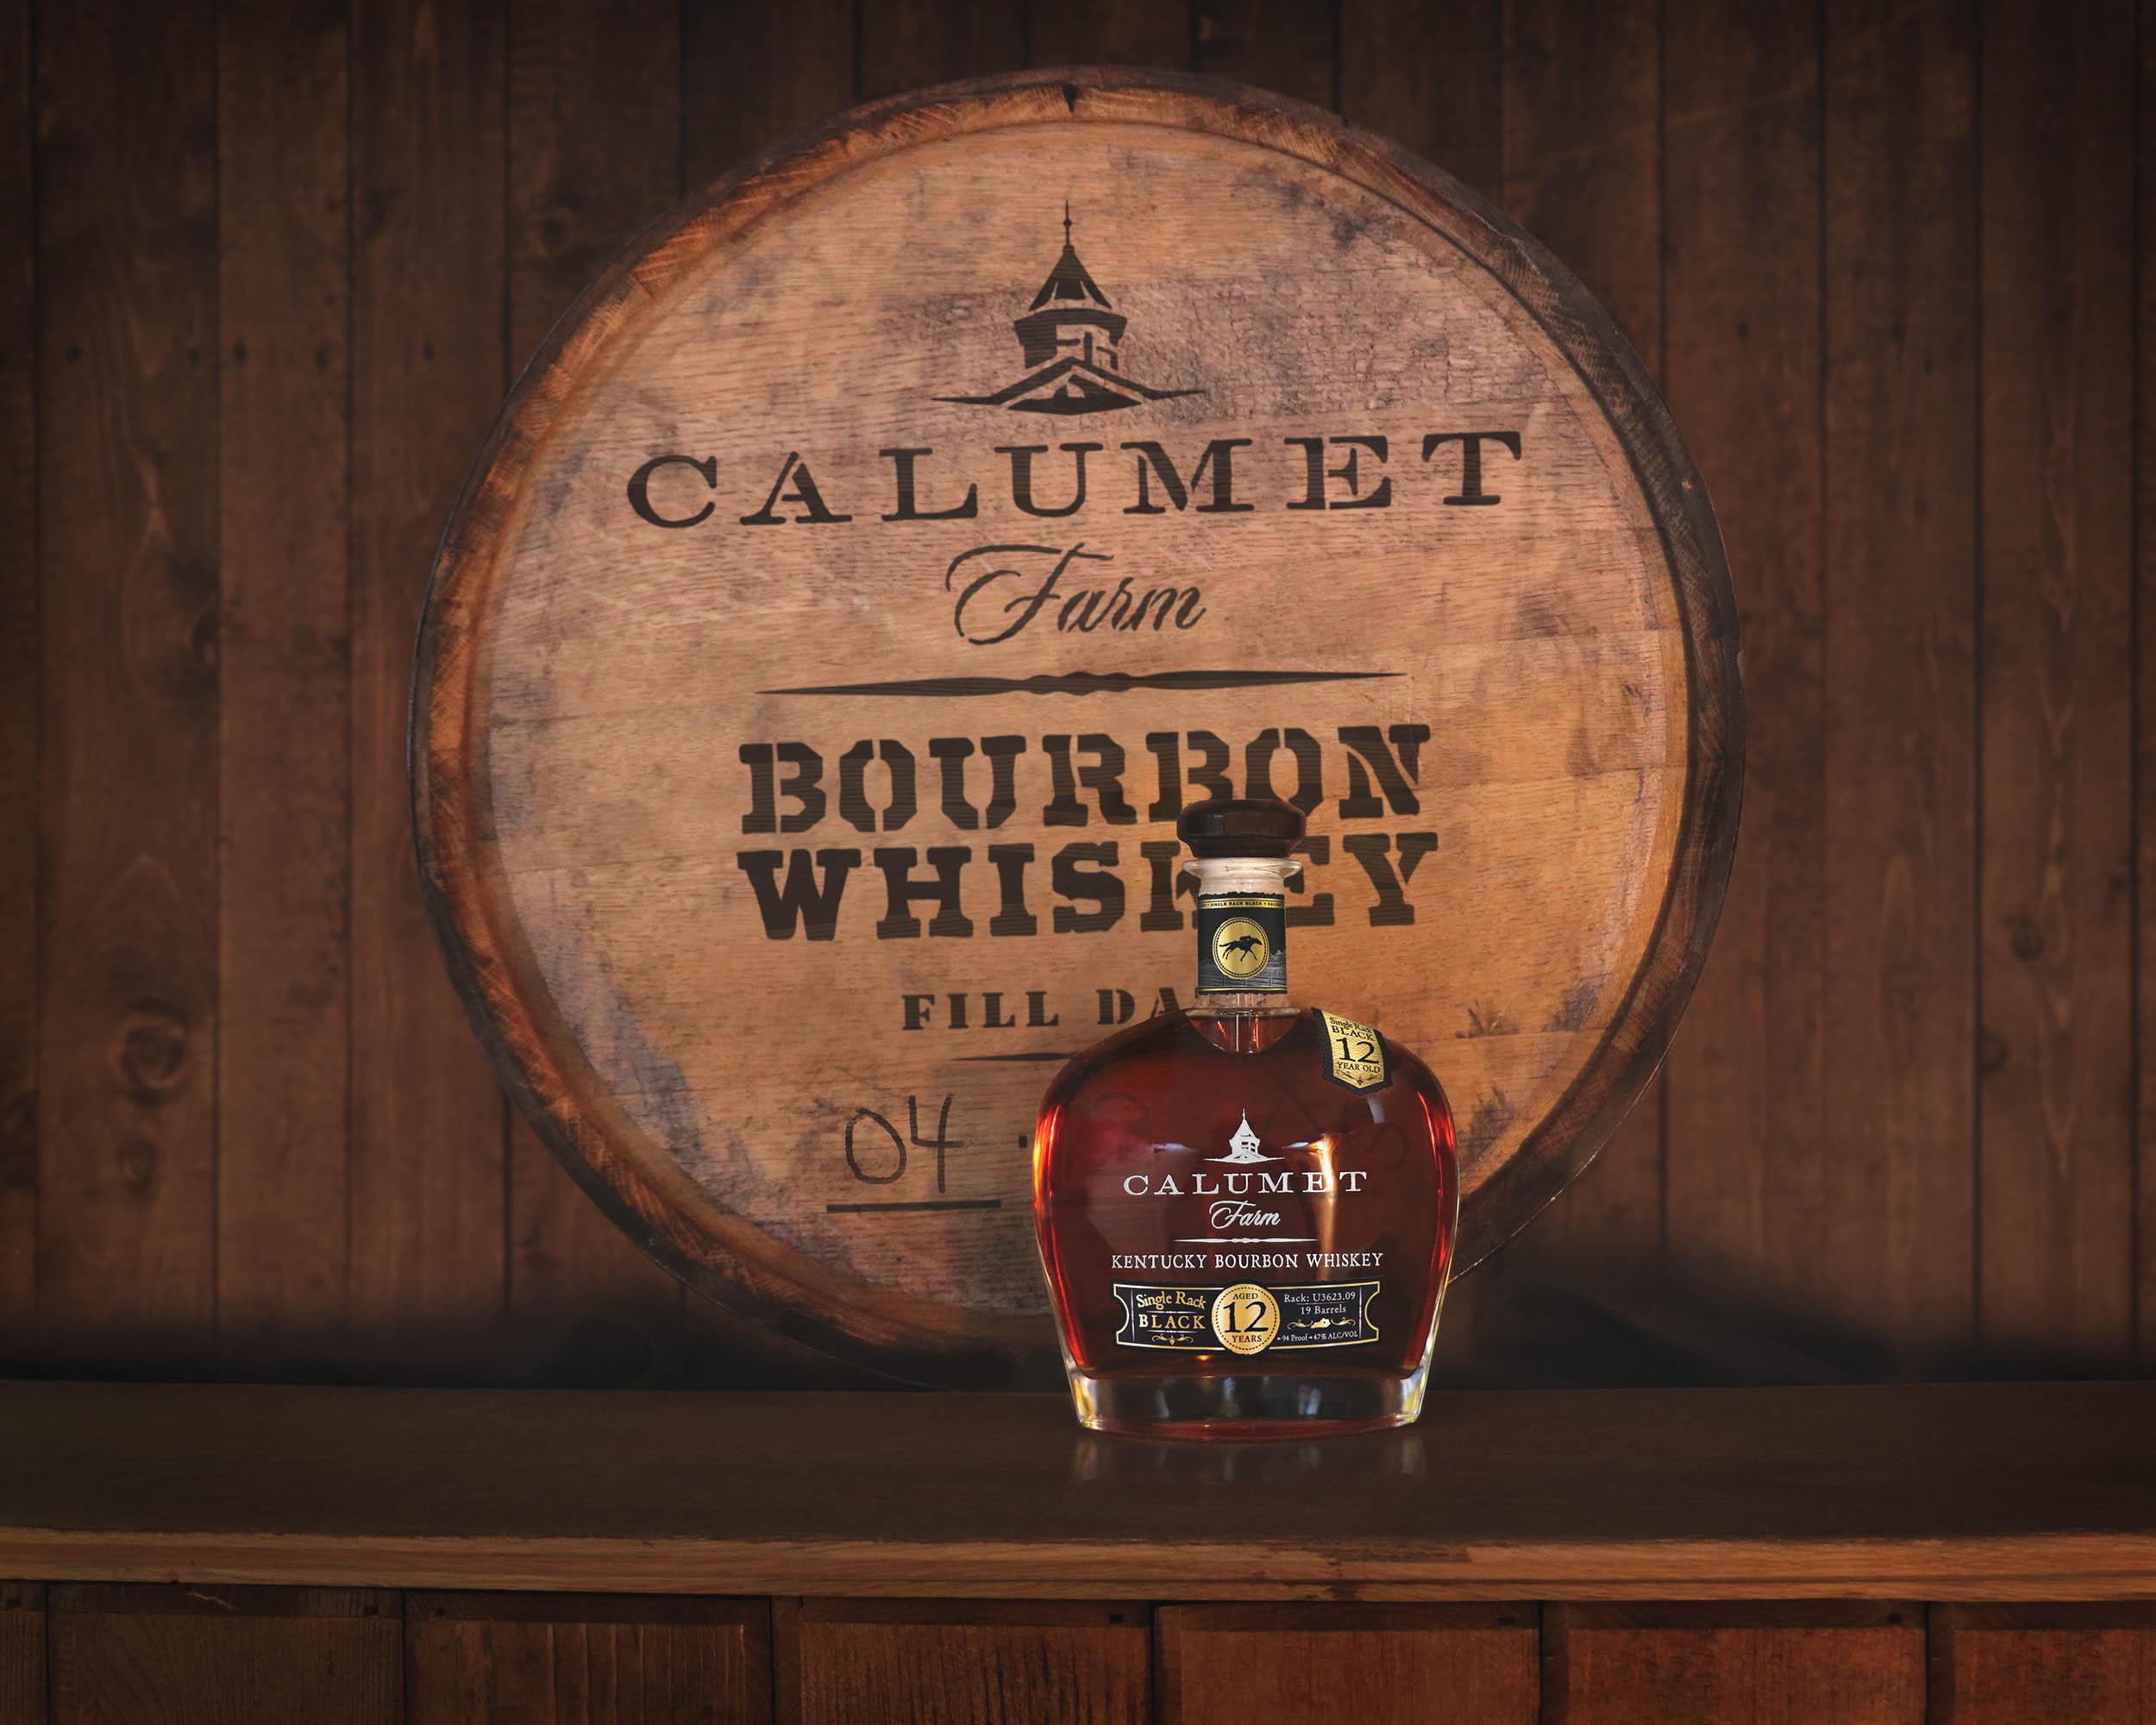 Calumet Single Rack Black 12 Year Old Bourbon